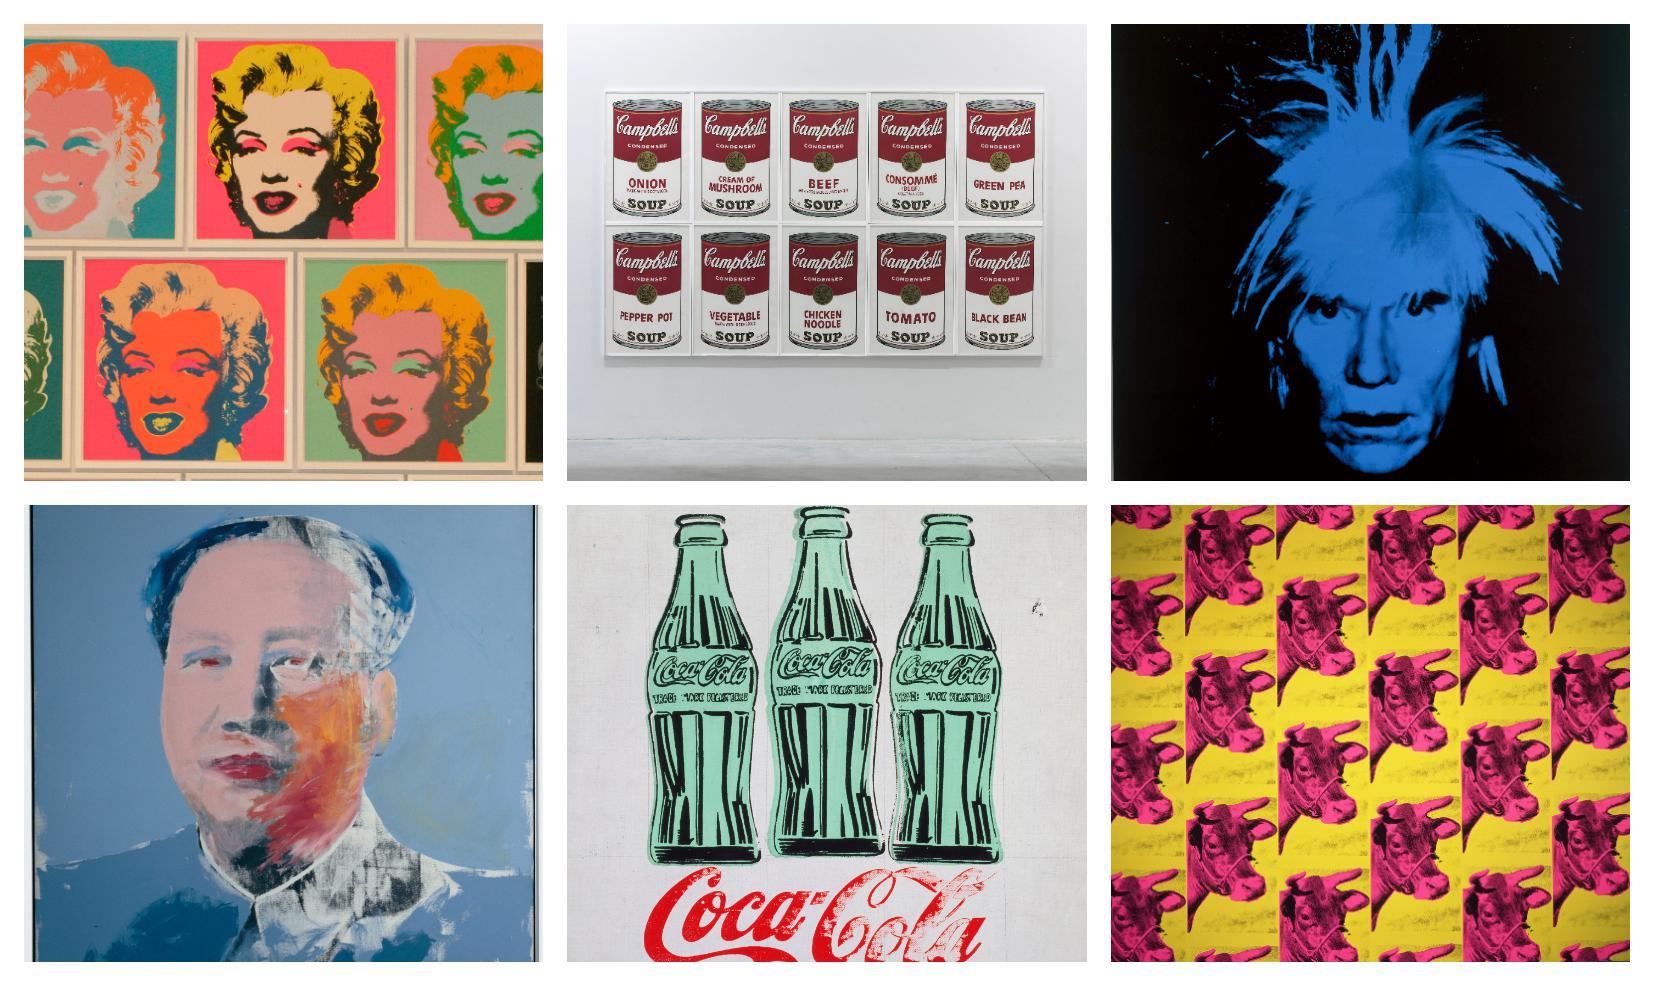 Crítica de arte. Warhol, el arte mecánico de un artista múltiple